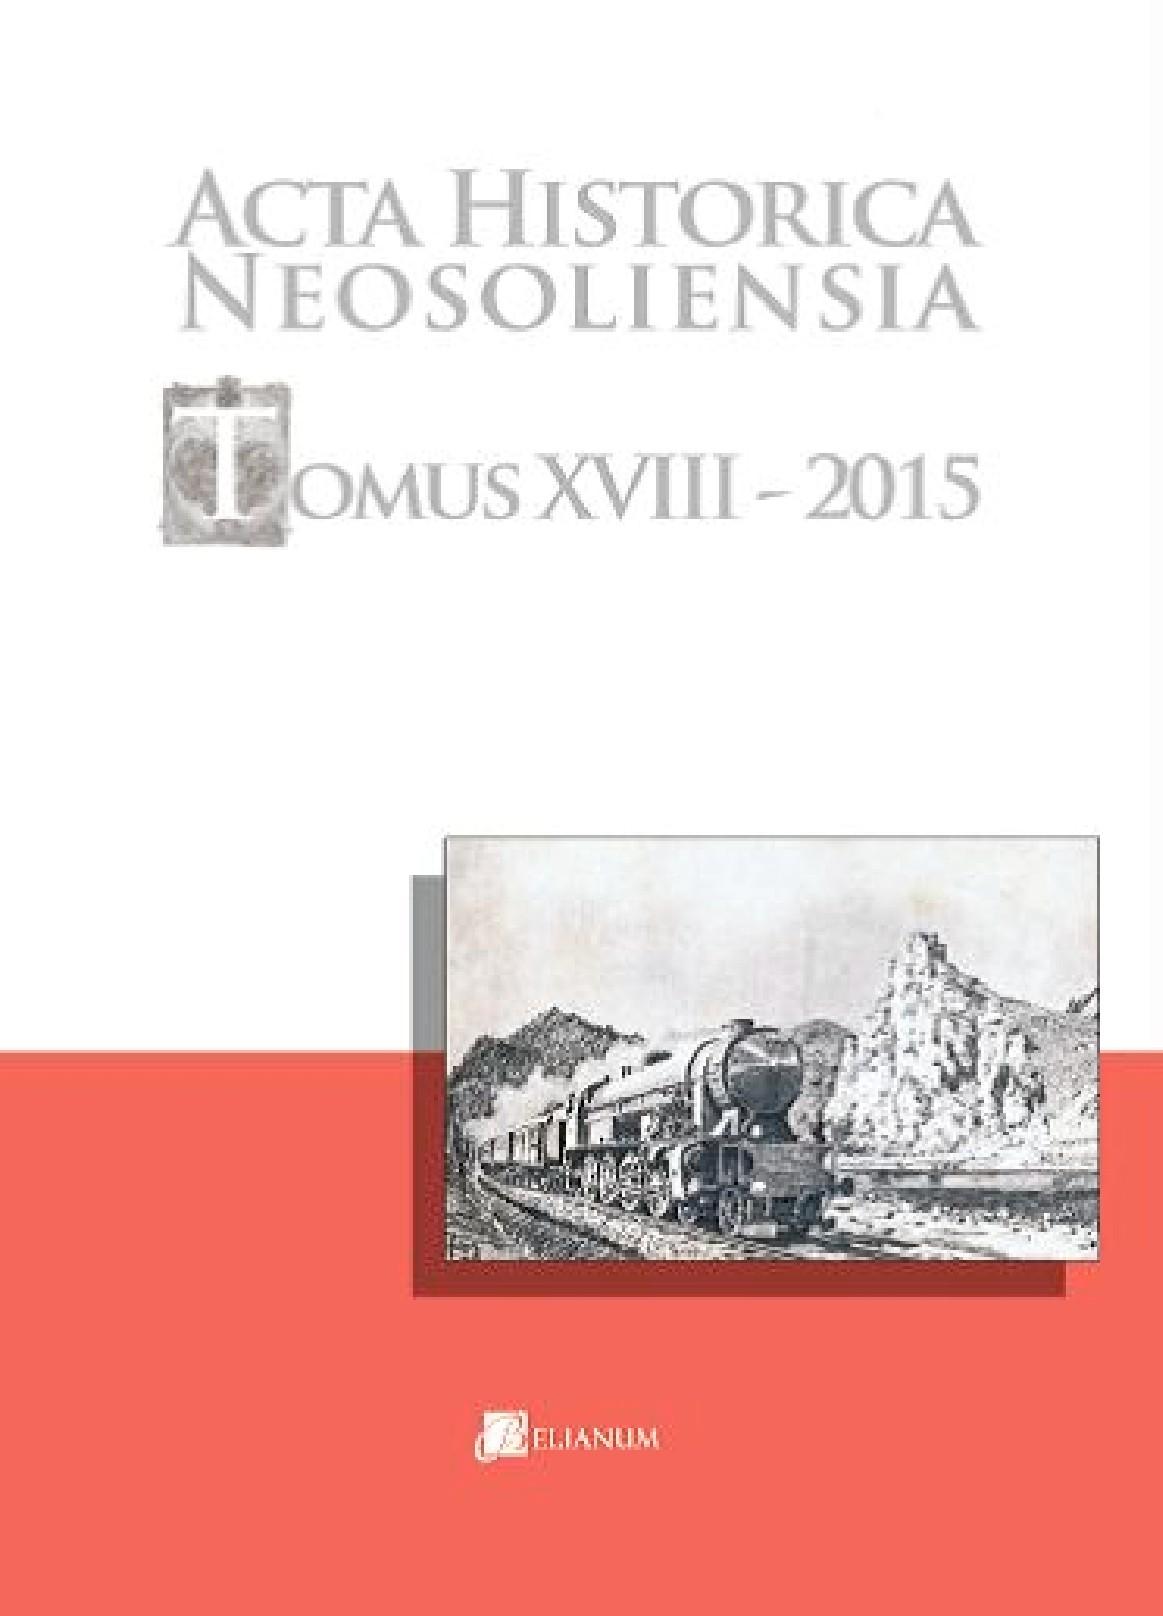 Acta historica neosoliensia, Tomus XVIII – 2015, Vol. 1 - 2